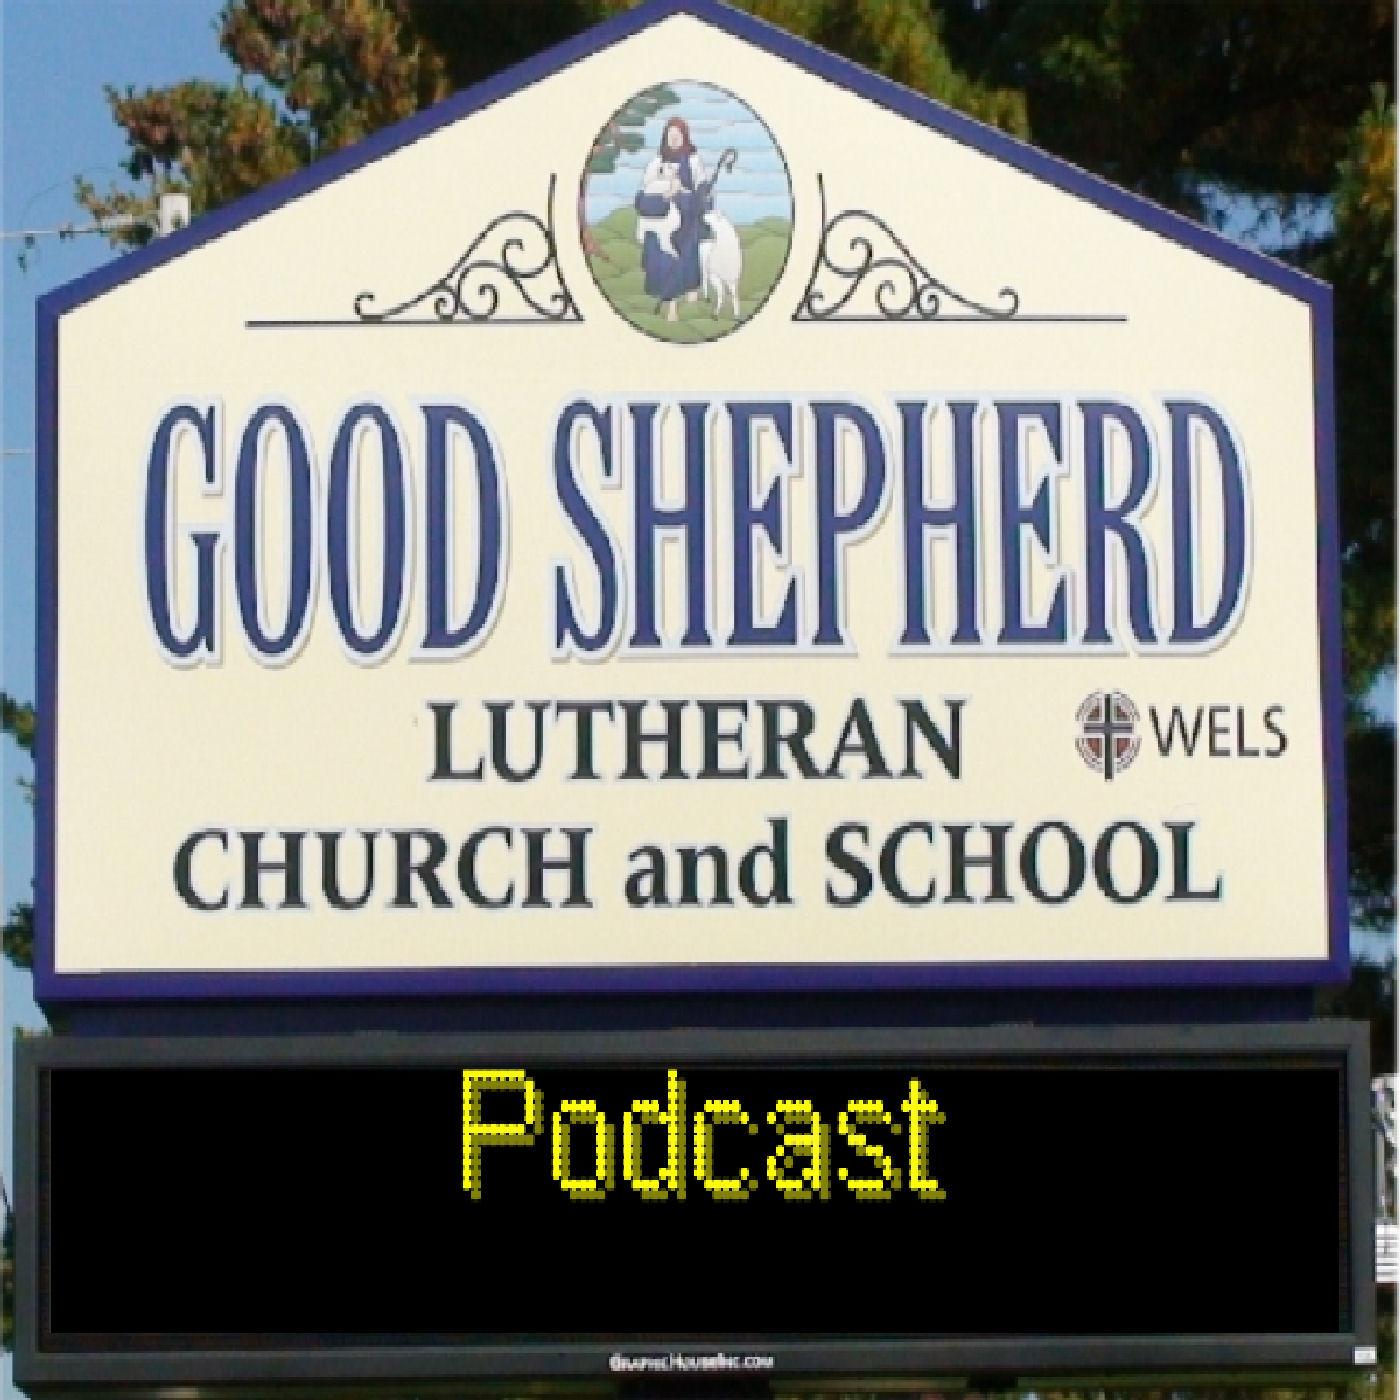 Good Shepherd Lutheran (WELS) Worship Podcast